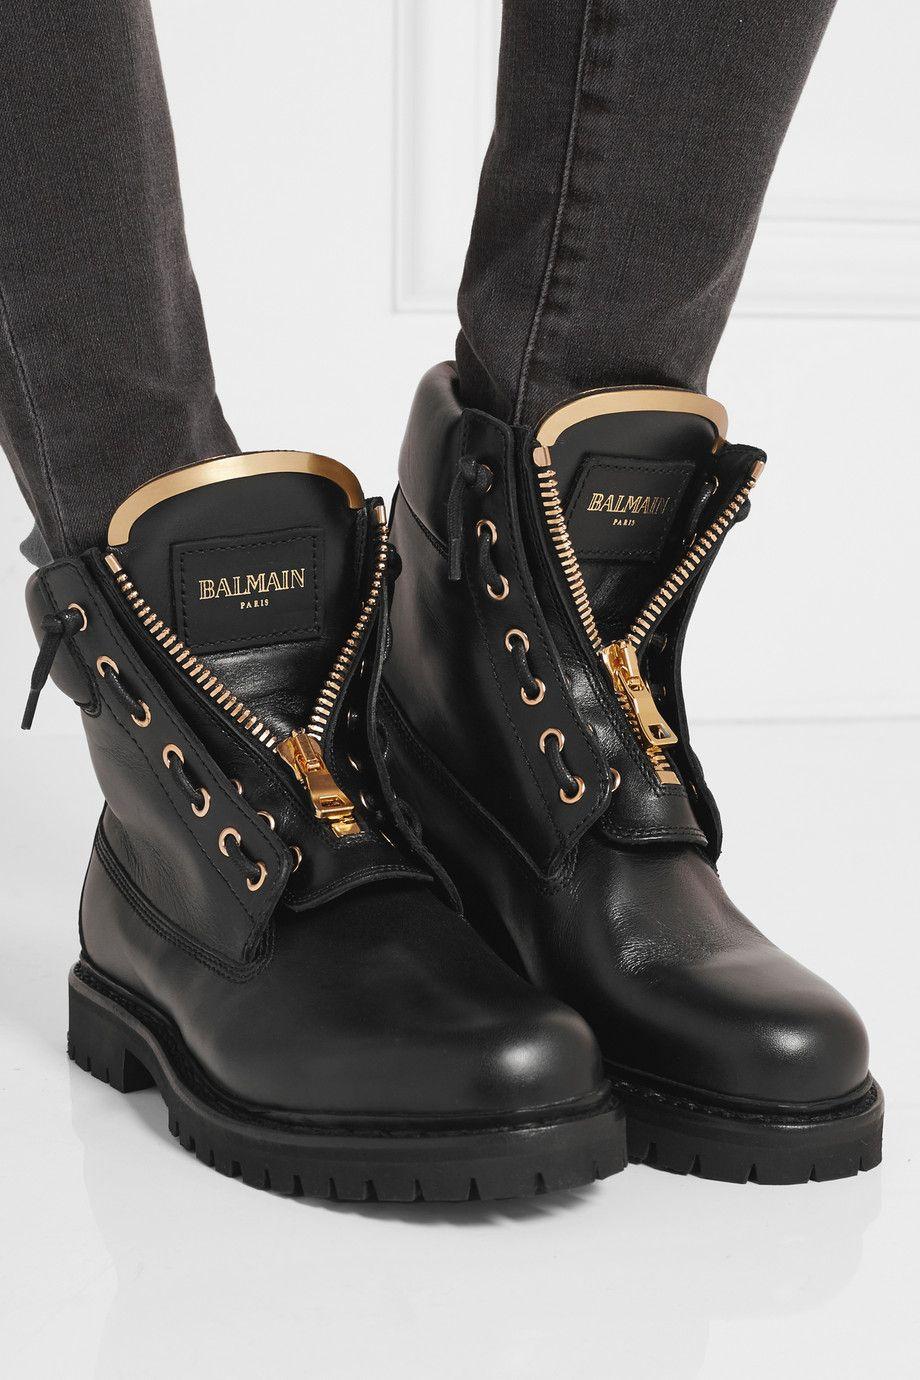 2e81324e88d6  Flats  Boots  AnkleBoots Balmain